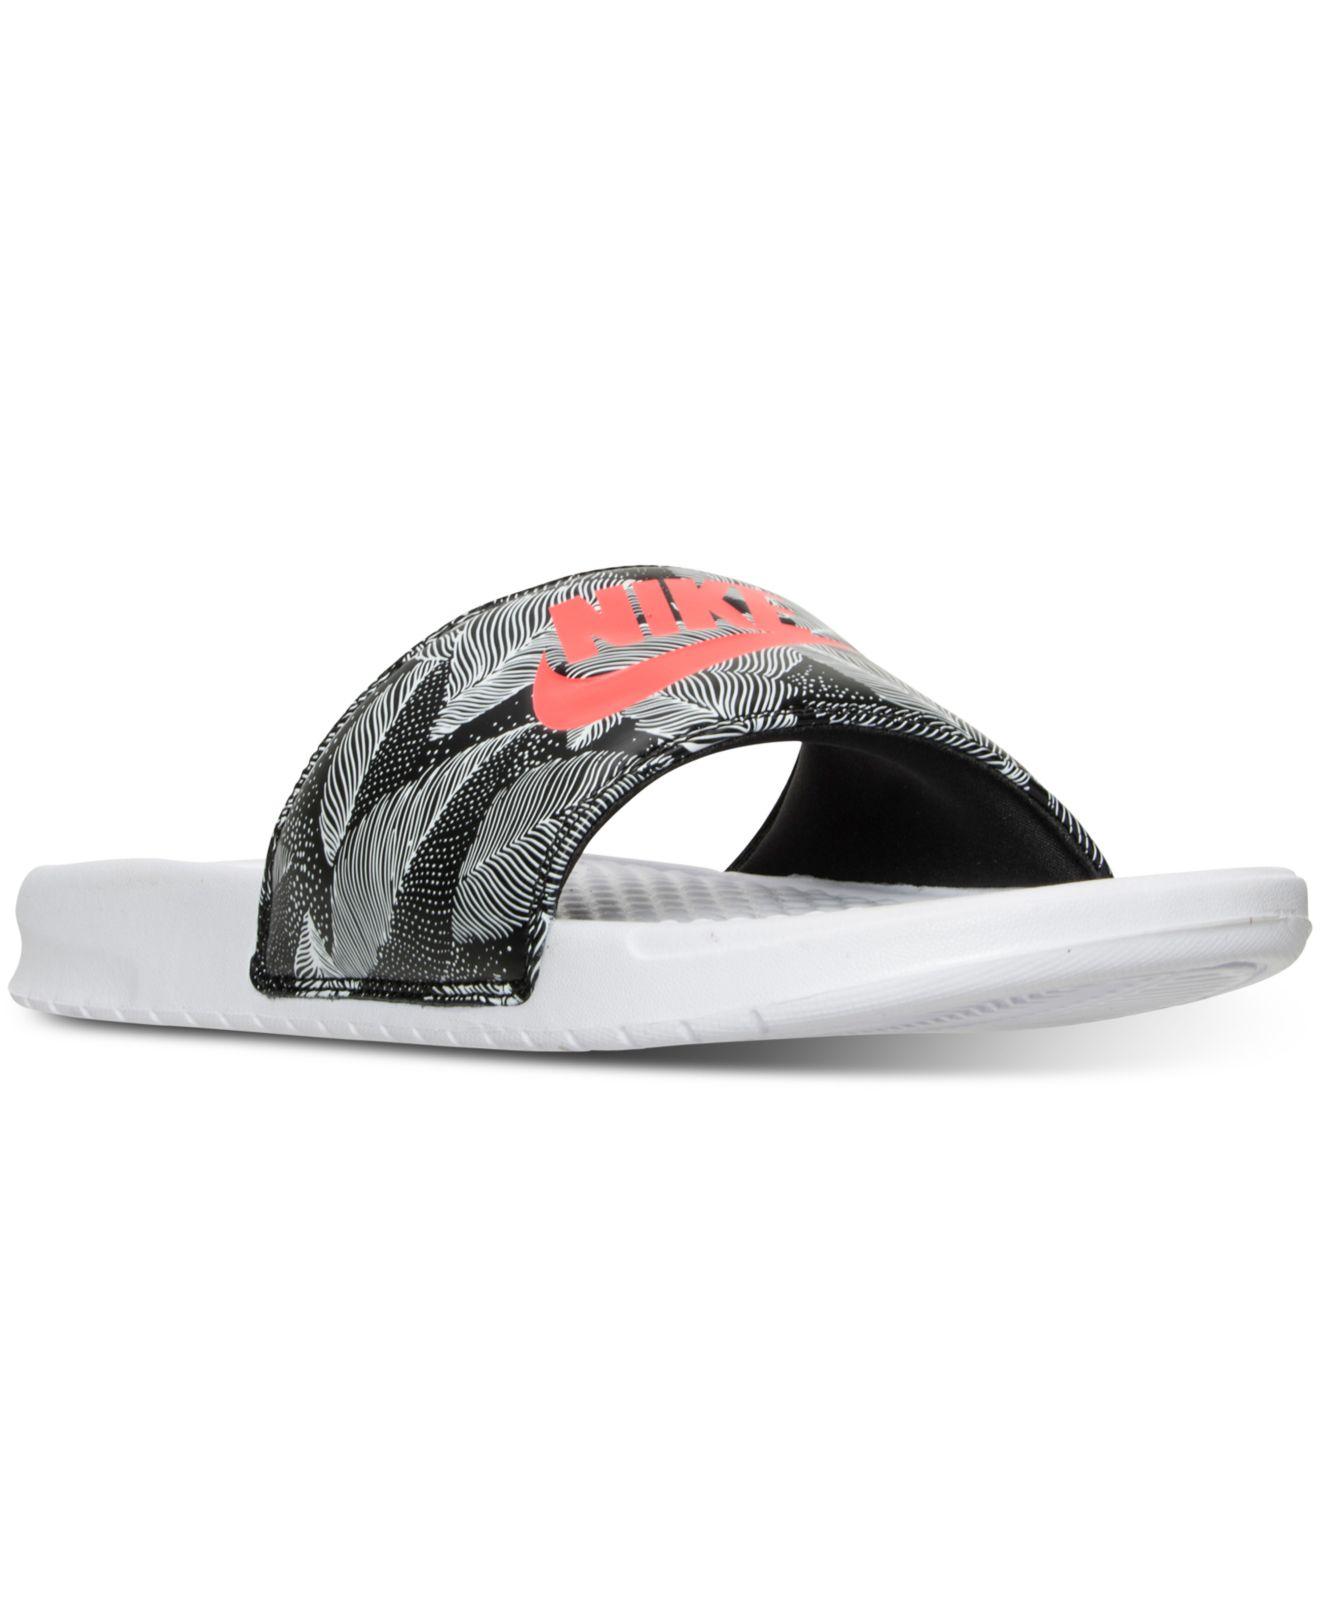 49e68c0cf7be Lyst - Nike Men s Benassi Jdi Print Slide Sandals From Finish Line ...